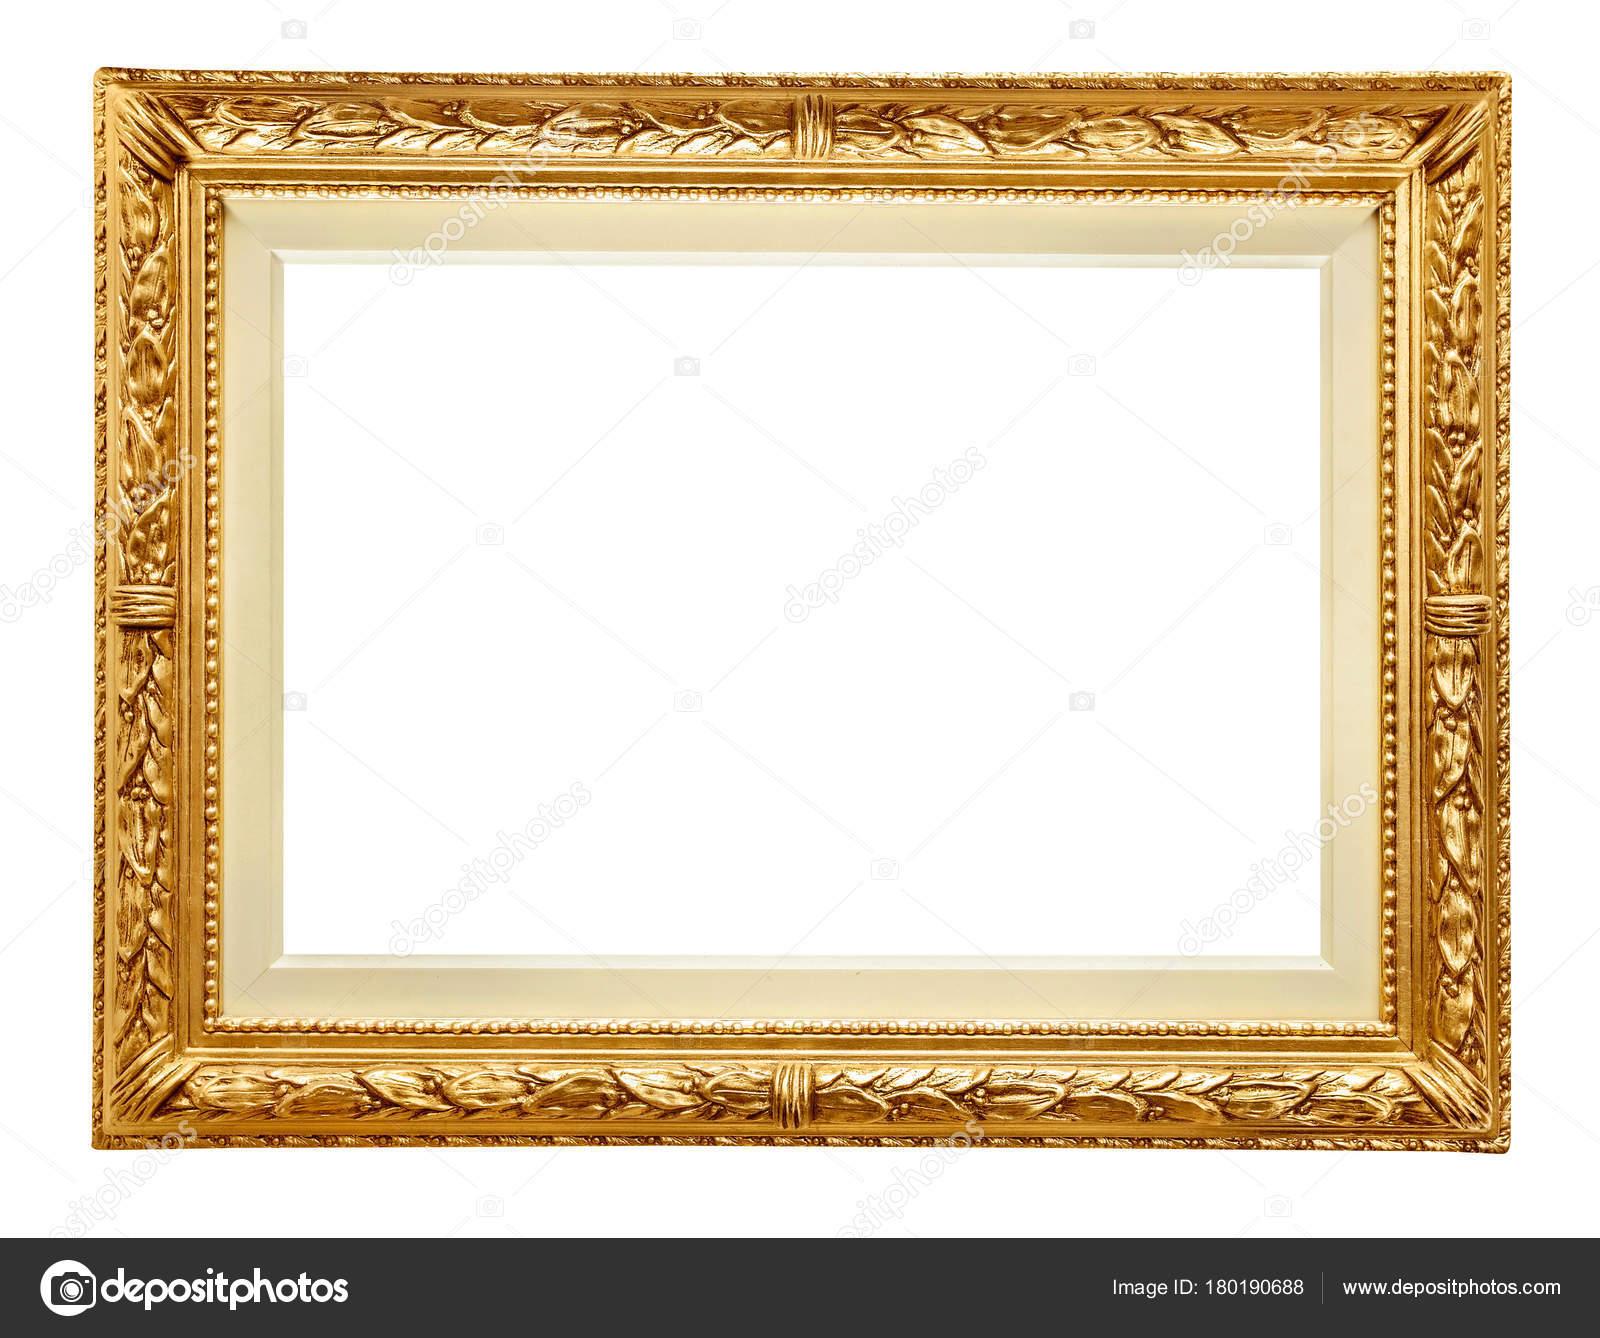 Goldener Rahmen auf weiß — Stockfoto © Goir #180190688